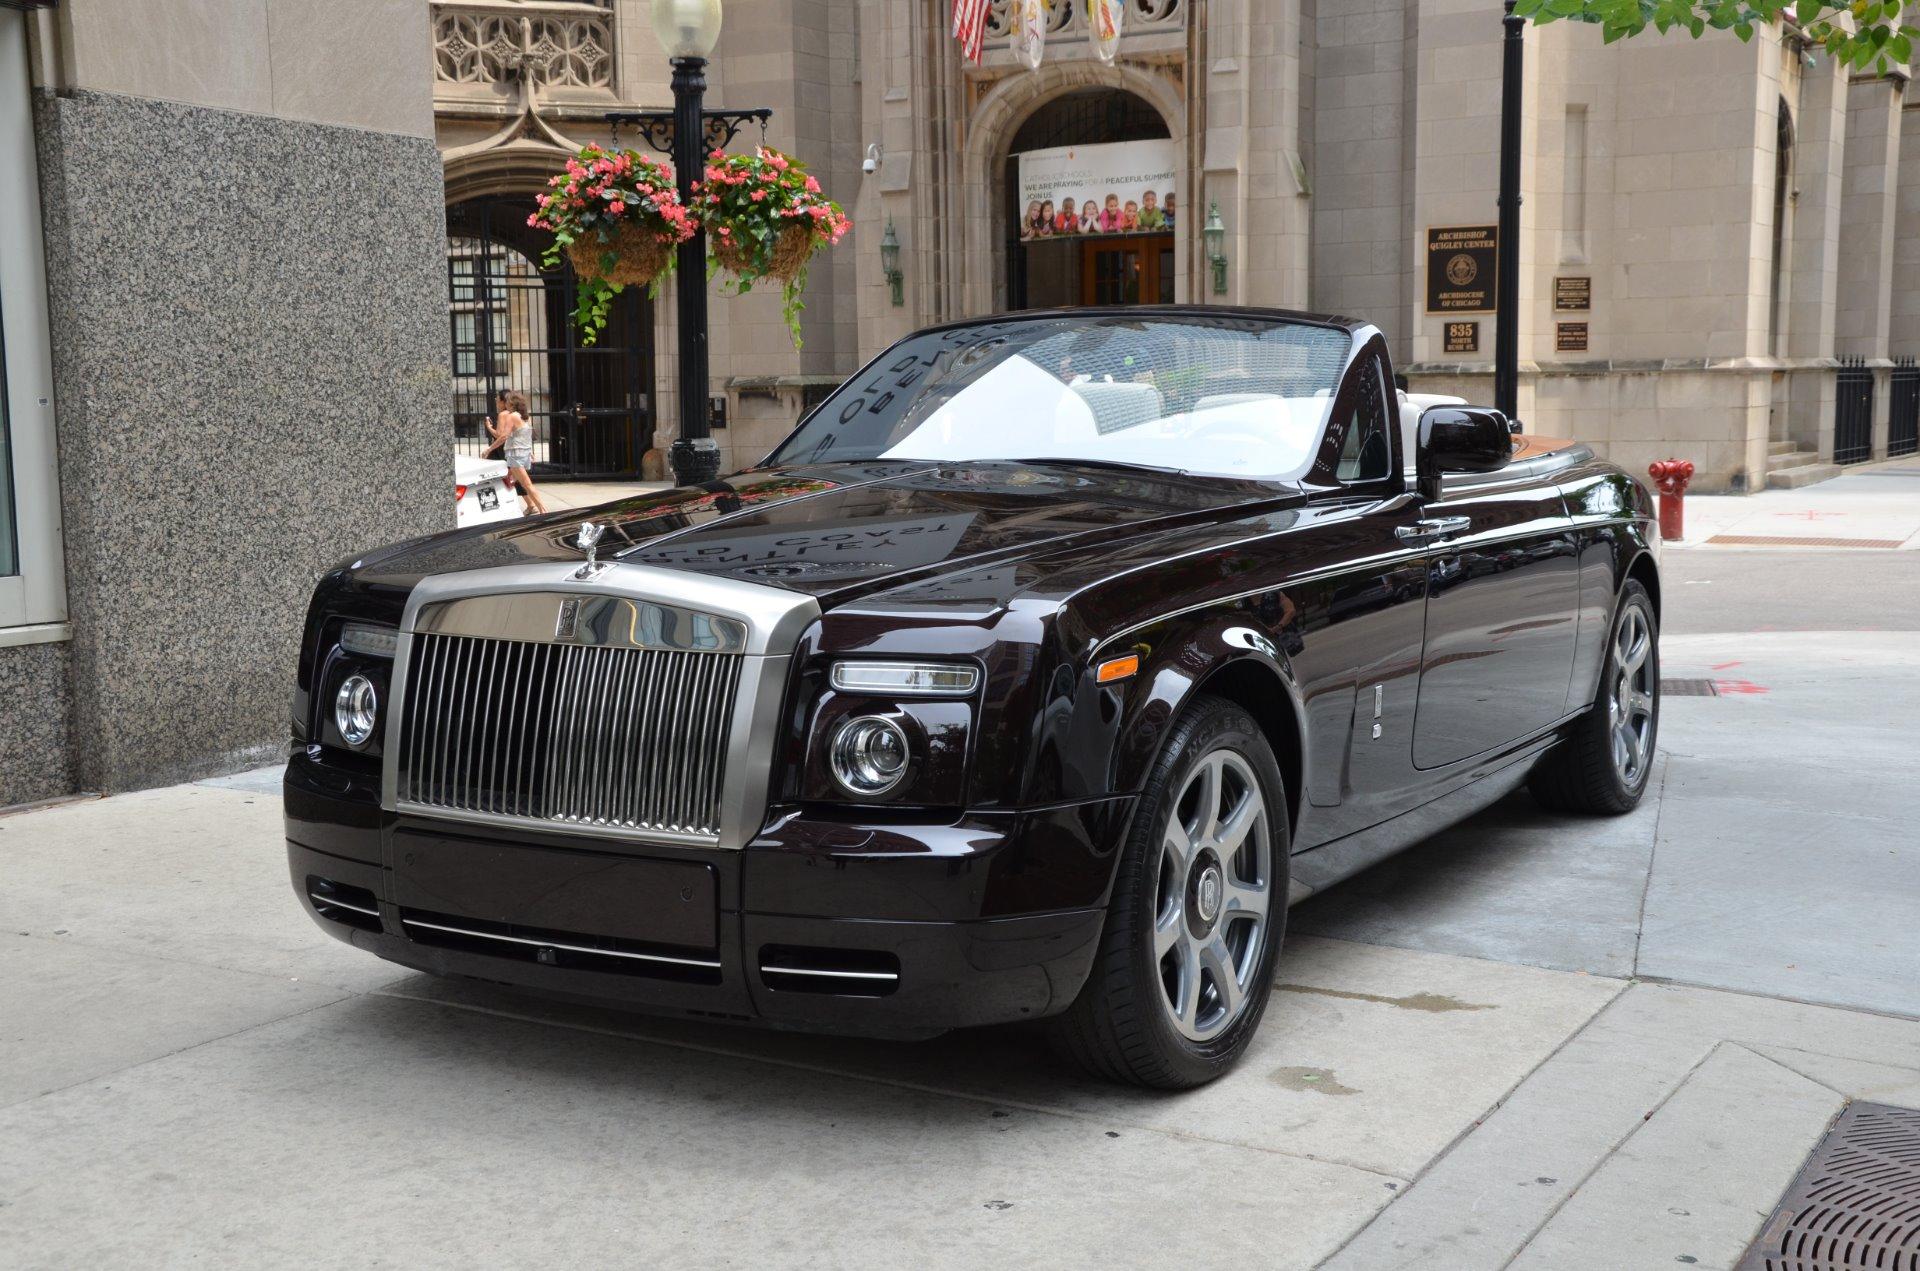 2012 Rolls-Royce Phantom Drophead Coupe Stock # B663A For